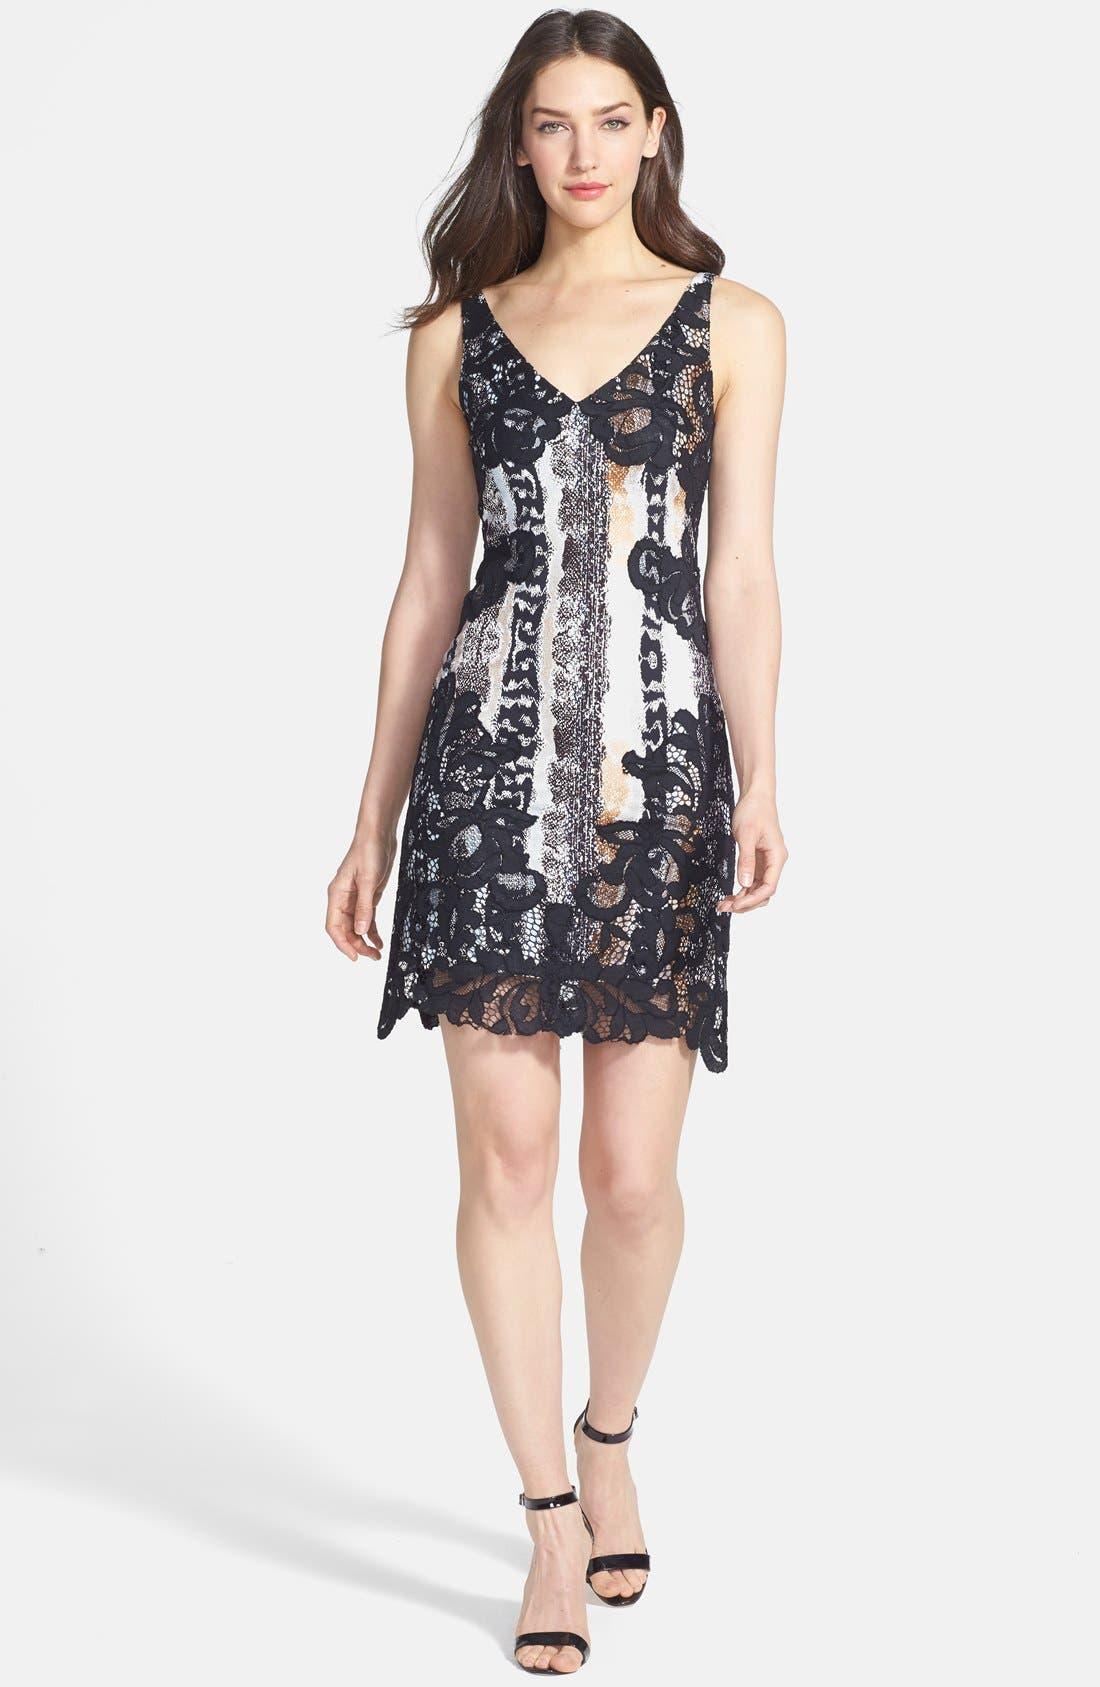 Alternate Image 1 Selected - Diane von Furstenberg 'Sara' Print Woven A-Line Dress